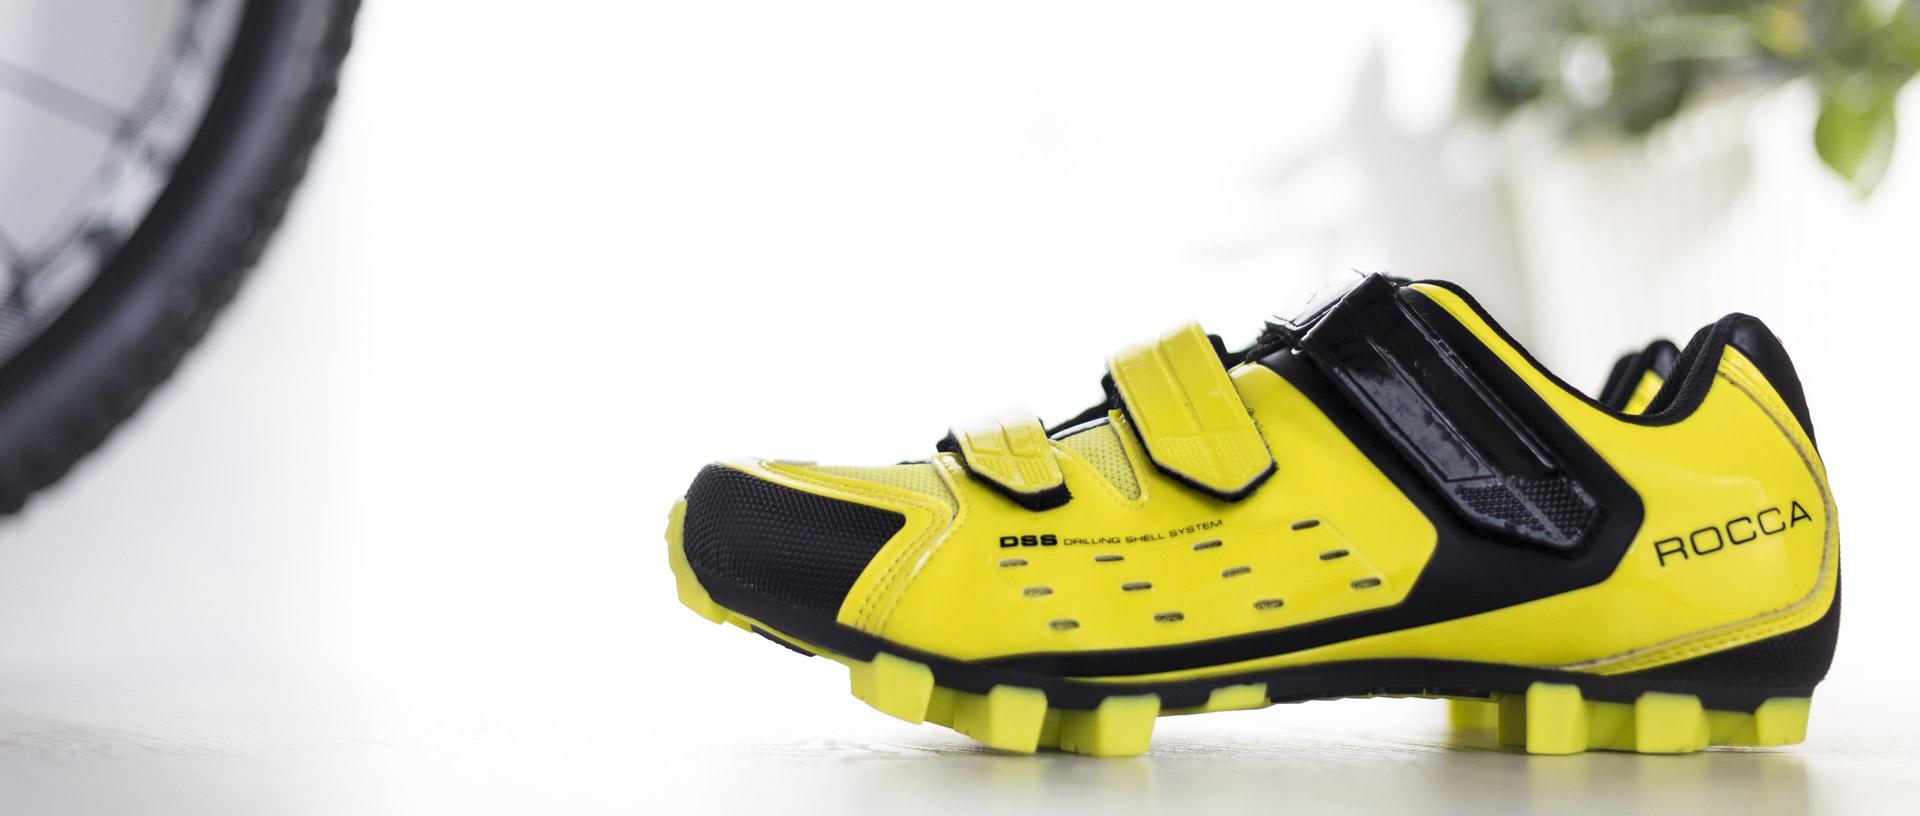 ROCCA MTB Shoe